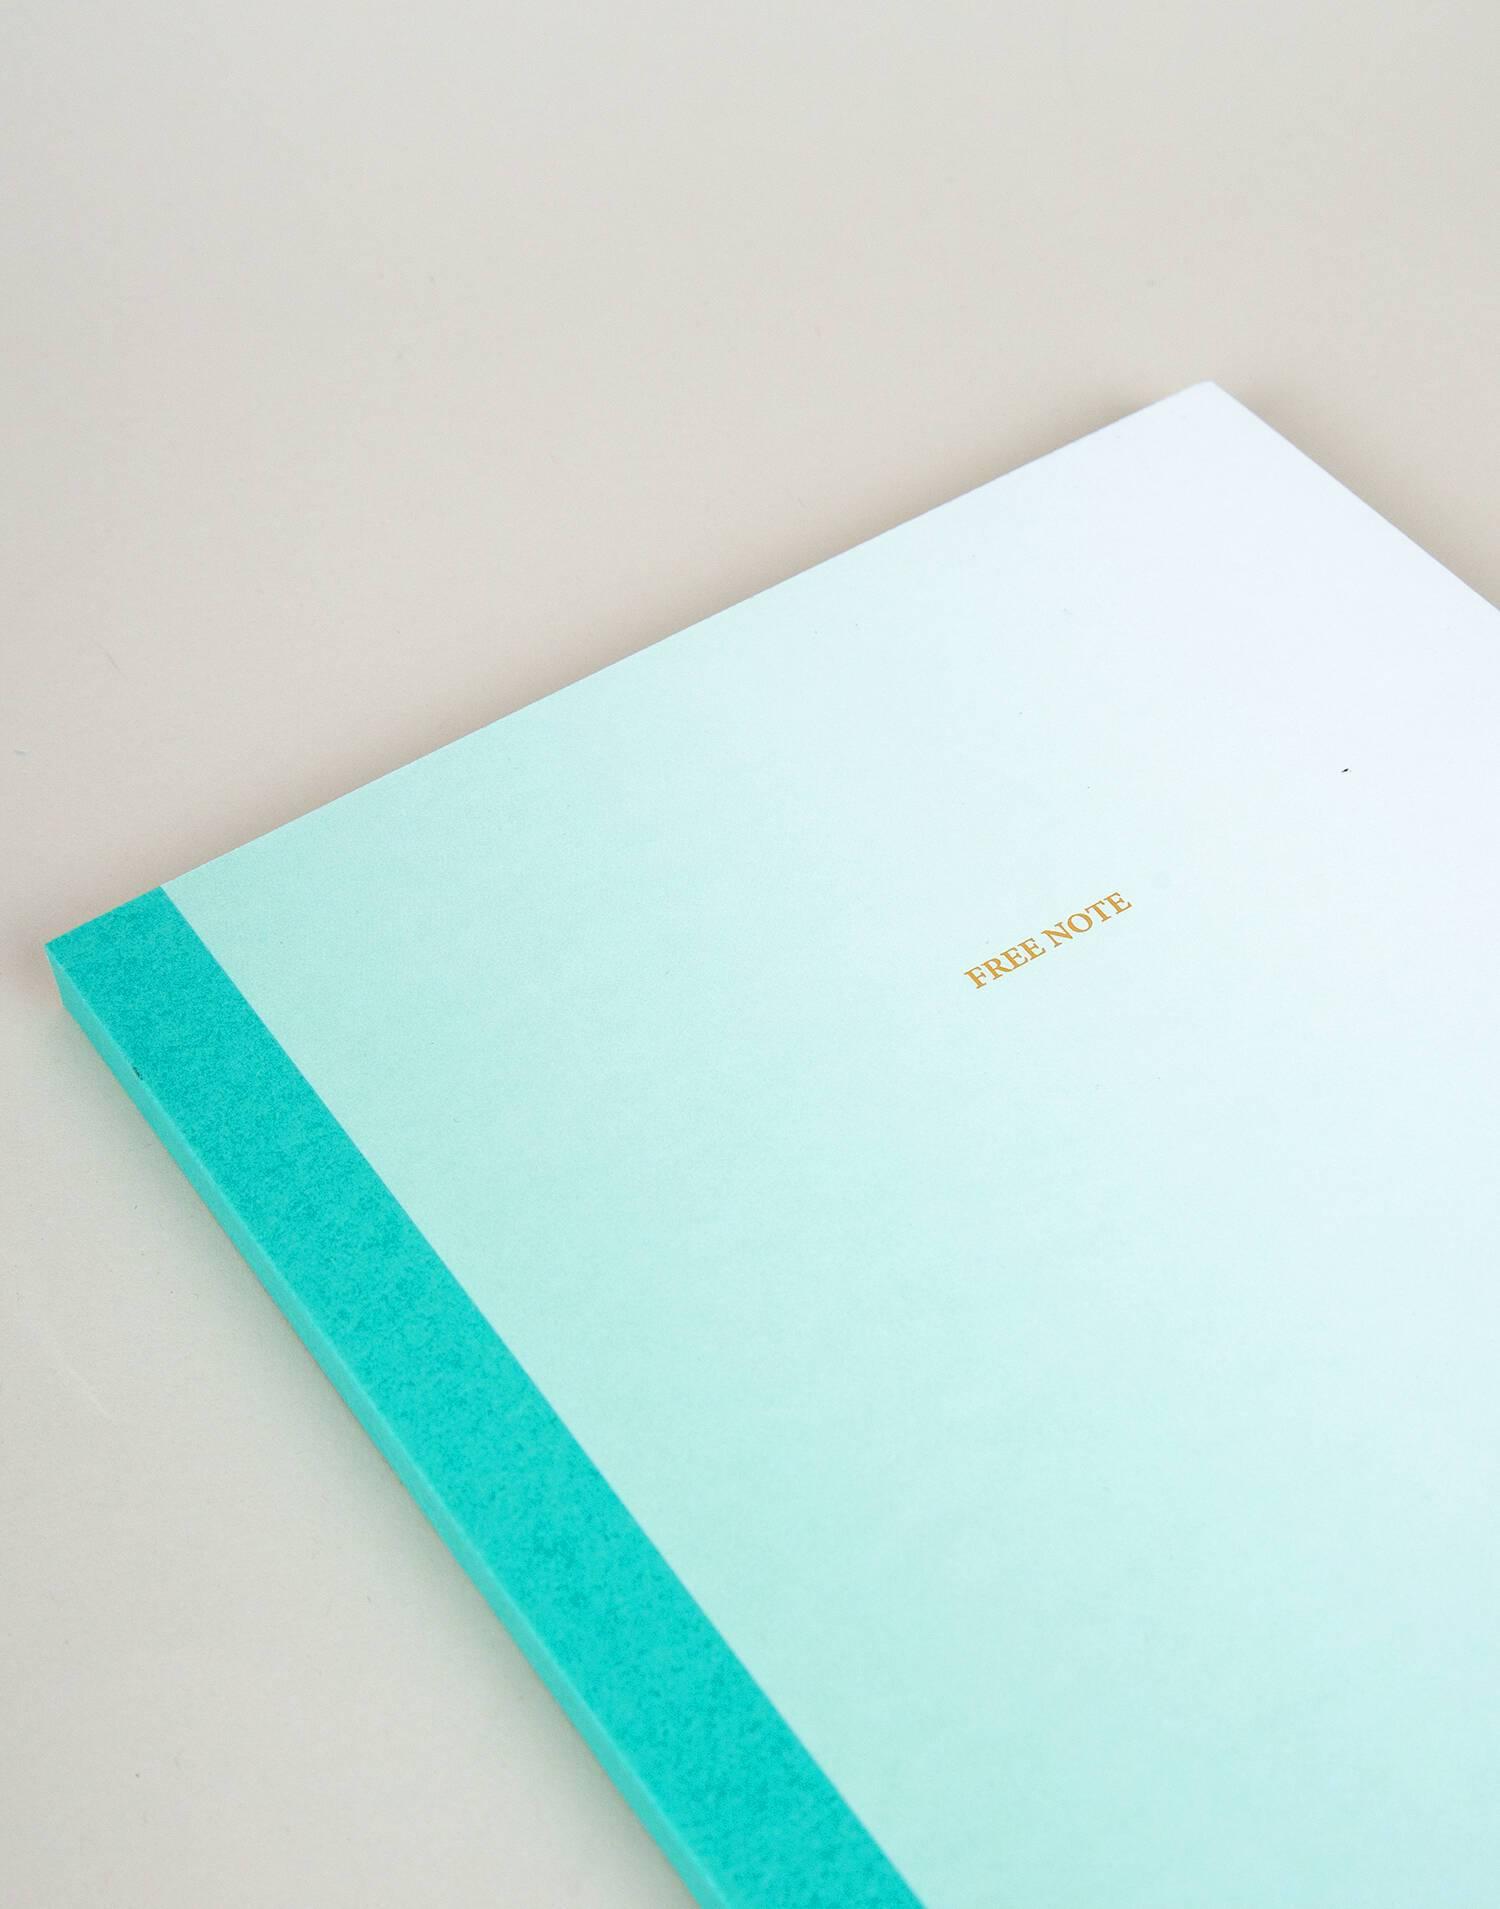 Spine a4 notebook